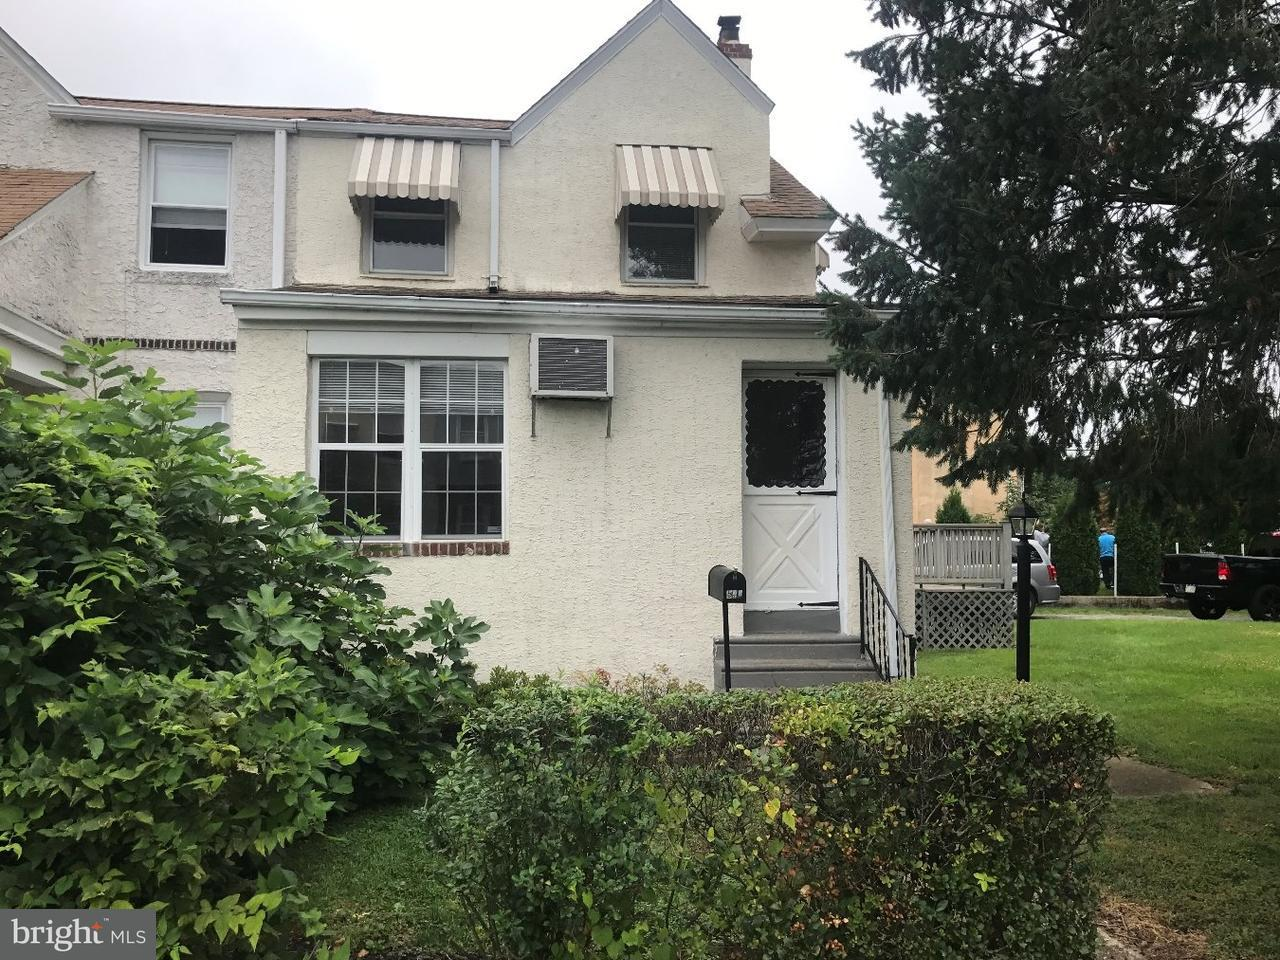 Casa unifamiliar adosada (Townhouse) por un Alquiler en 578 A Street King Of Prussia, Pennsylvania 19406 Estados Unidos